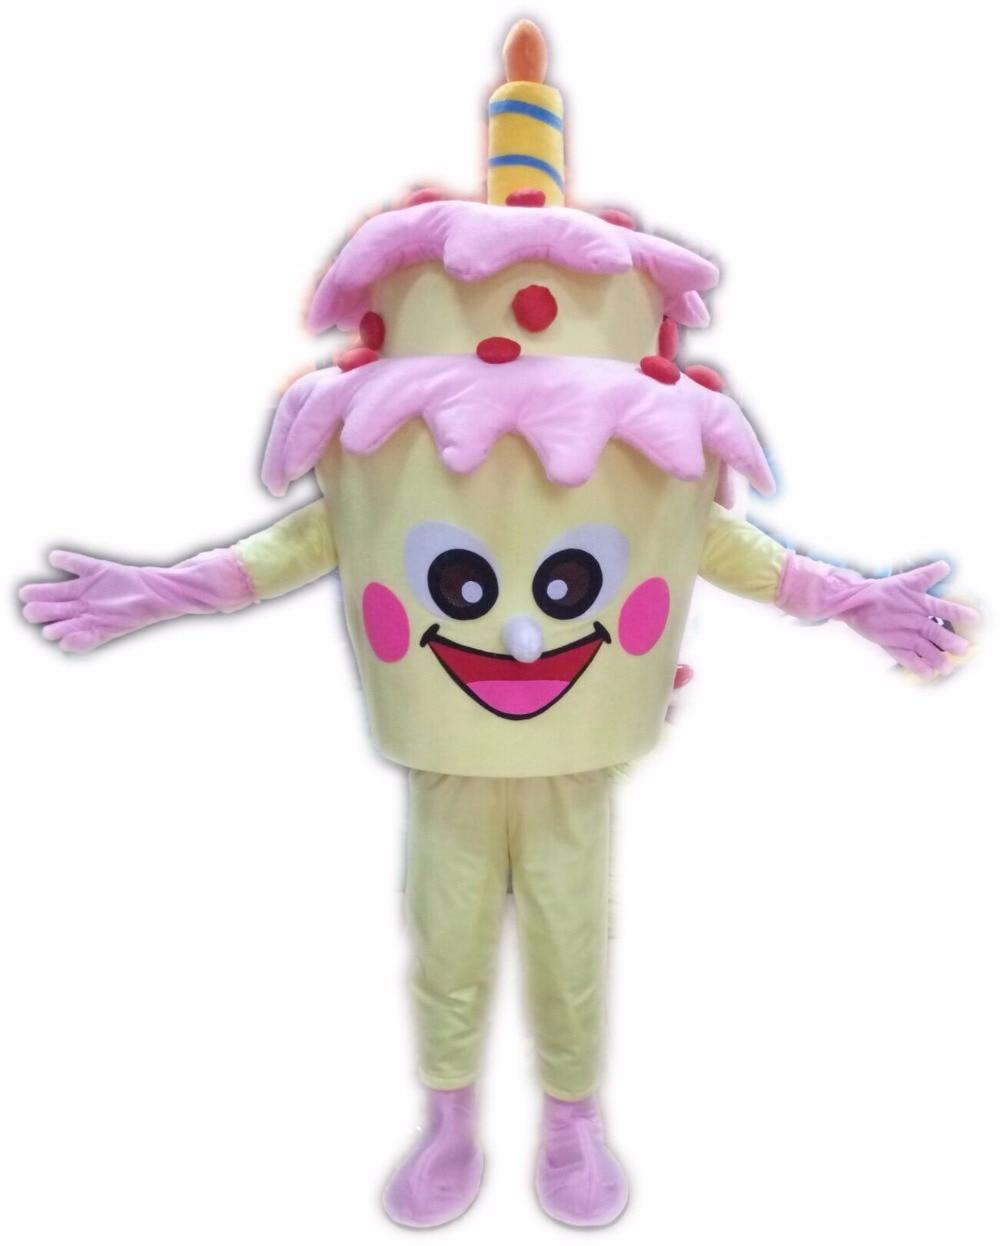 2018 New Adult Size Birthday Cake Mascot Costume Cake